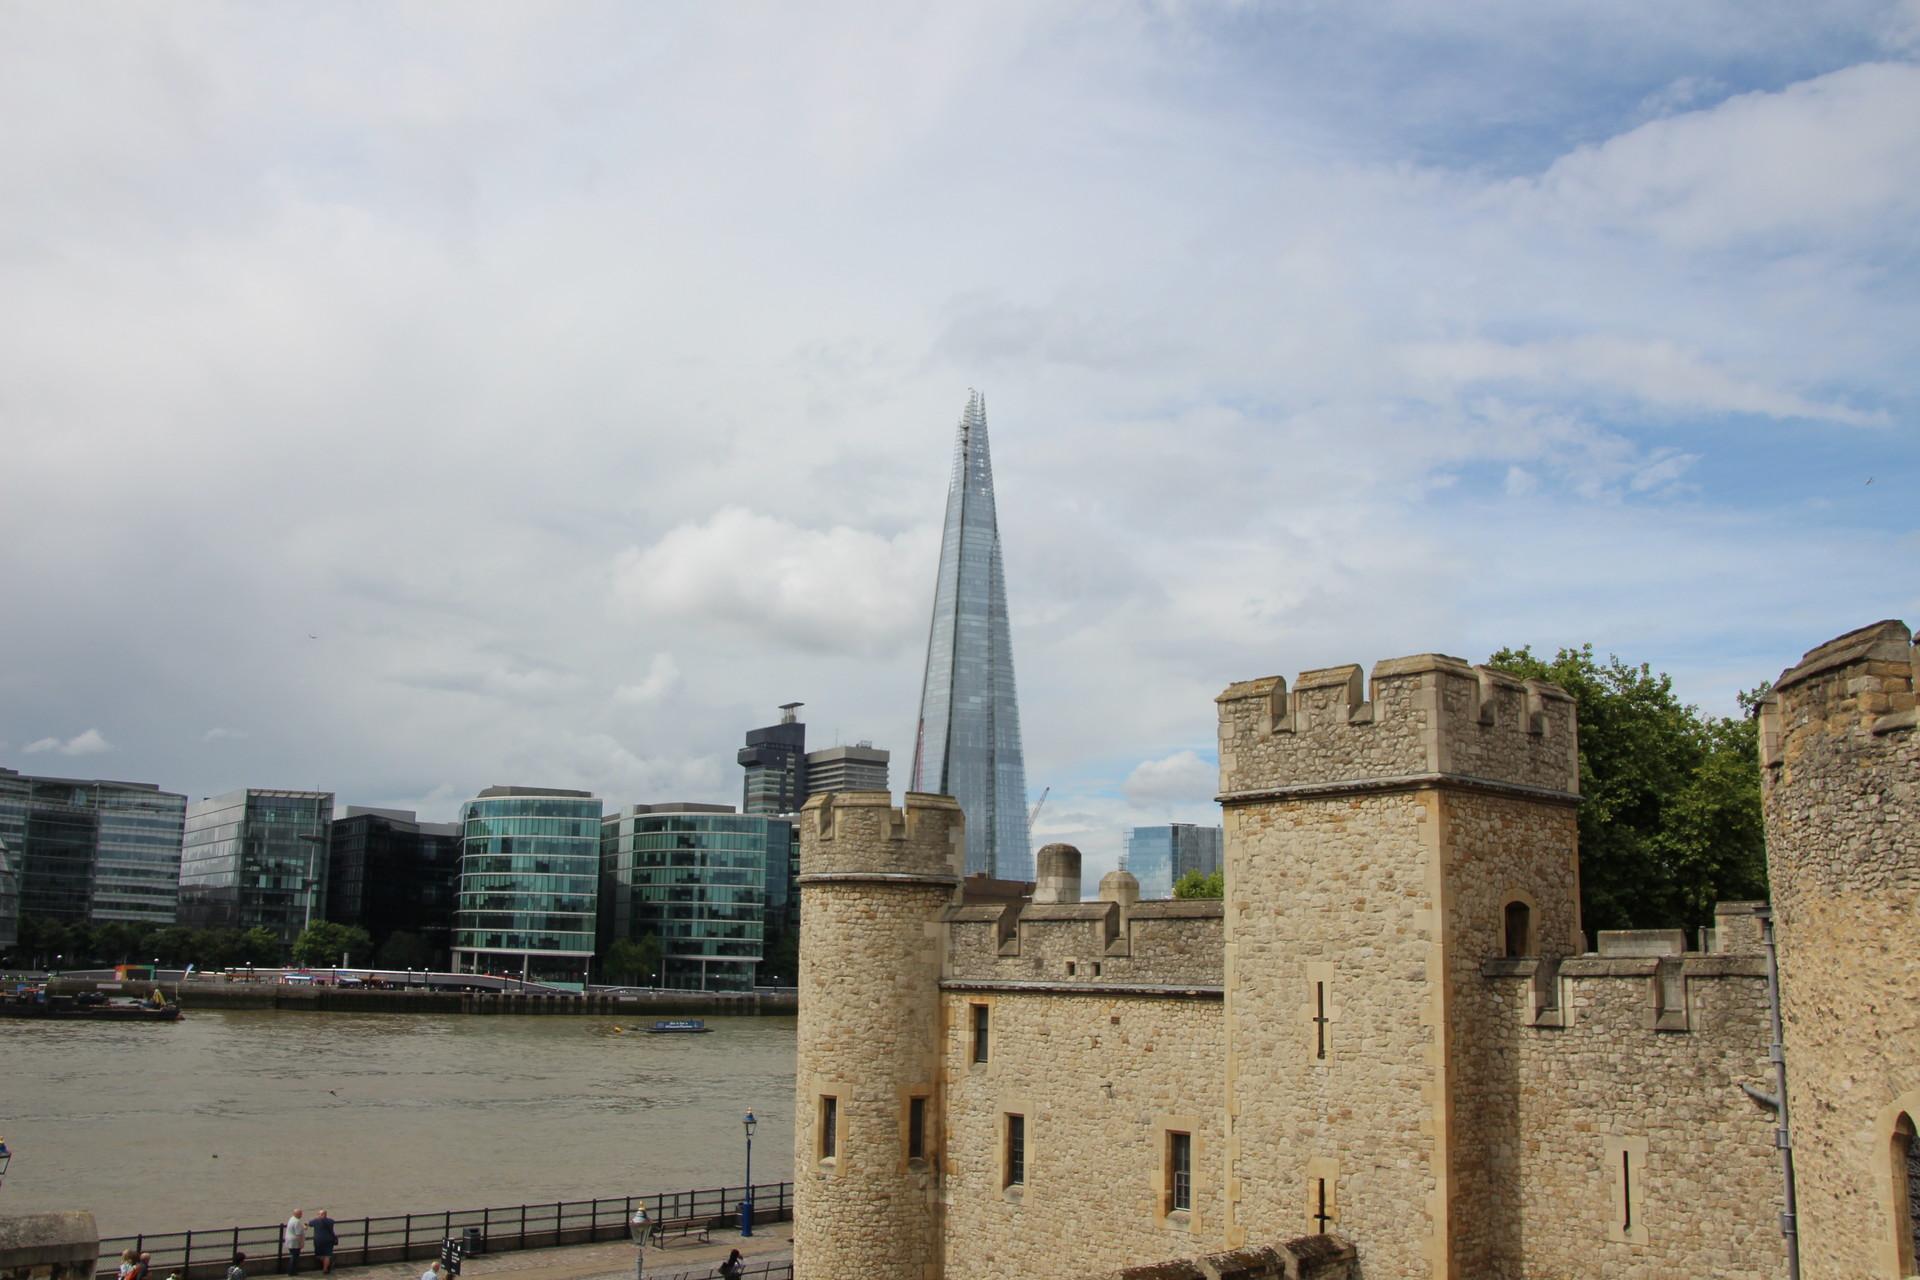 tower-of-london-la-torre-londres-ac20335